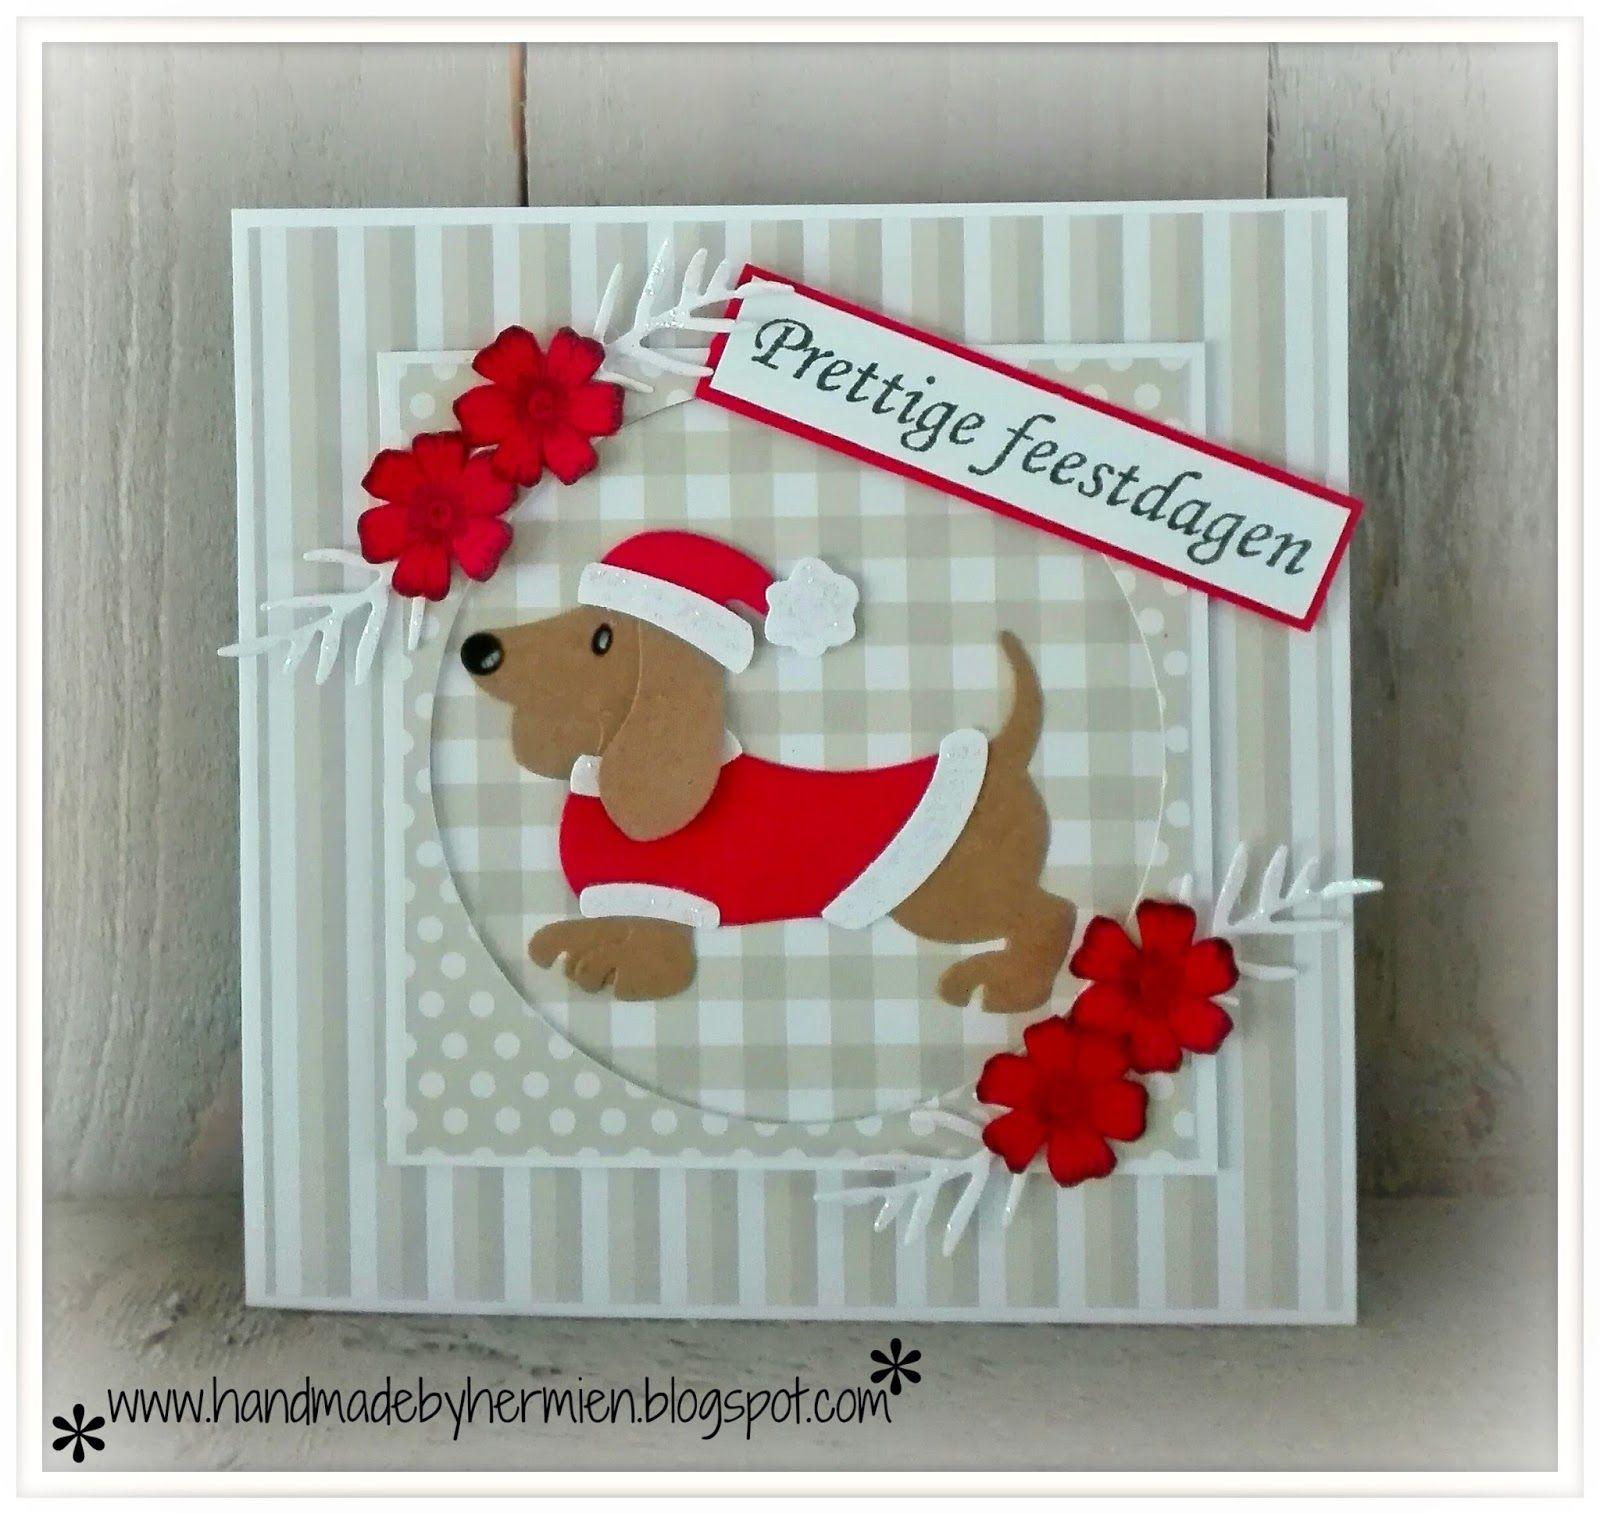 Card critters dog marianne design die set dachshund card critters dog marianne design die set dachshund handmadebyhermien kristyandbryce Image collections